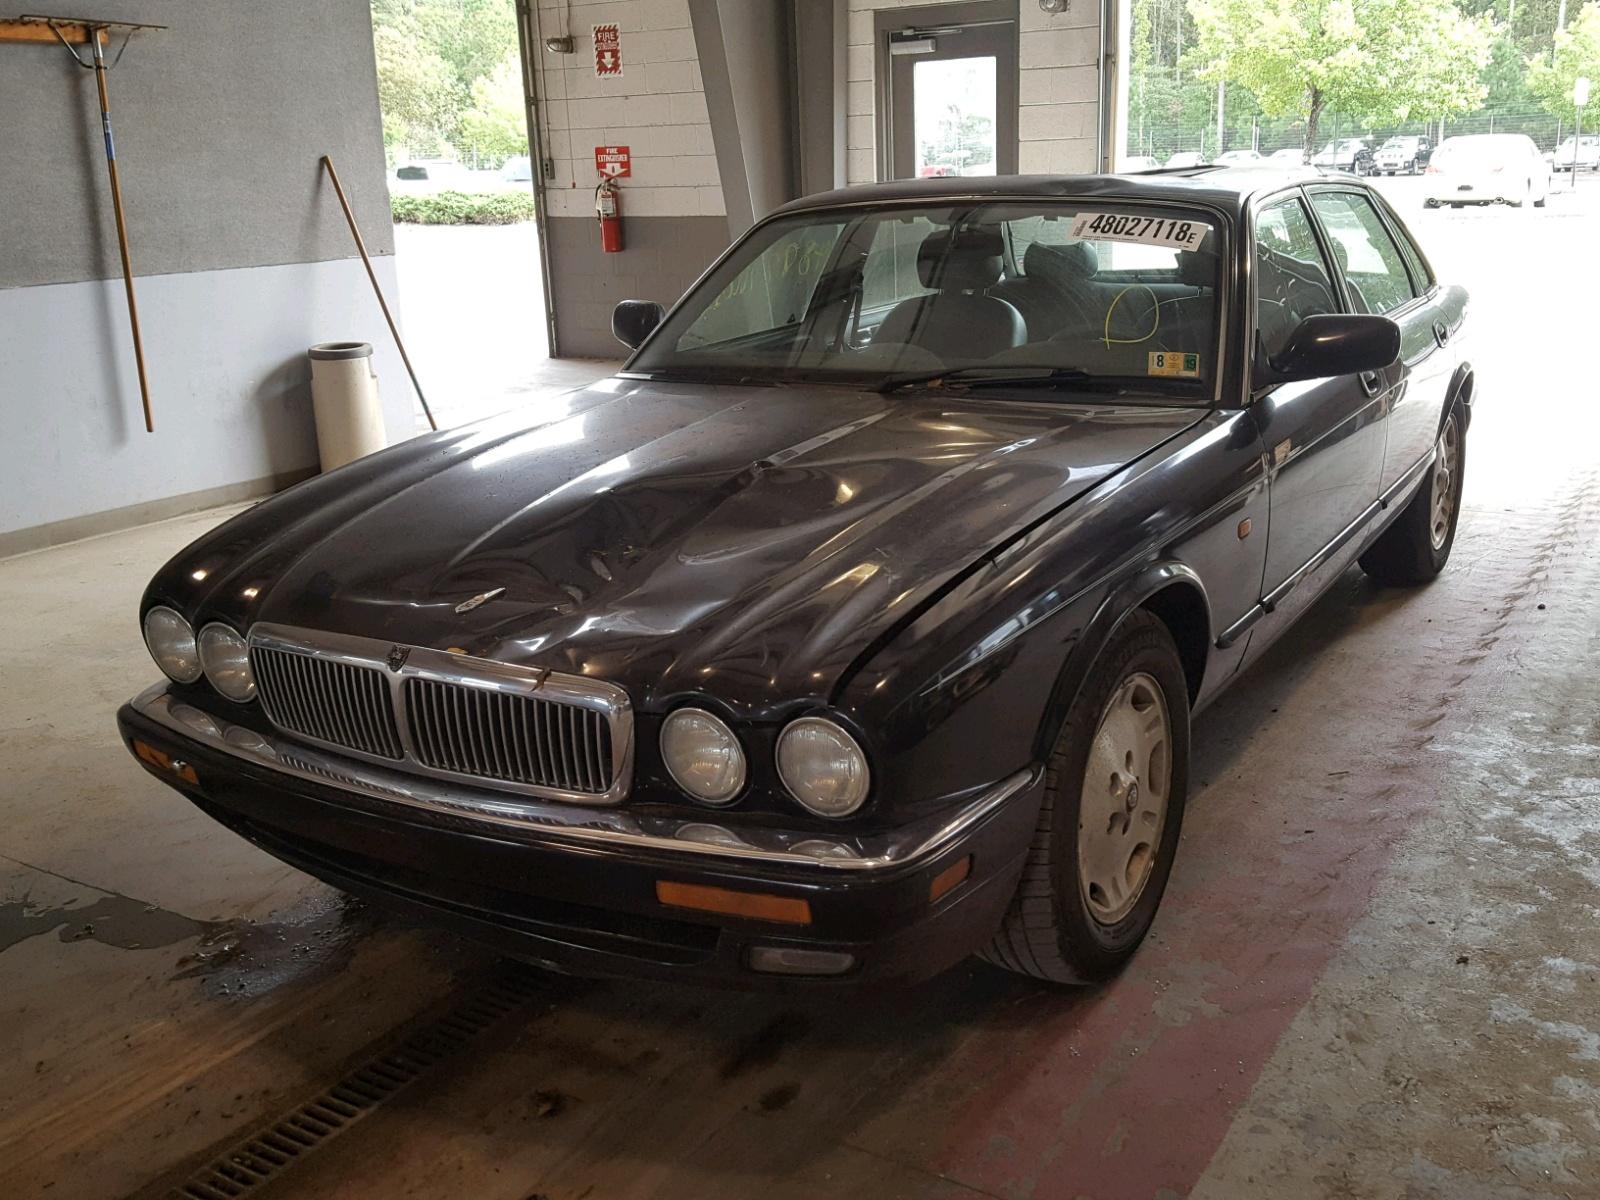 1996 Jaguar Xj6 For Sale At Copart Sandston Va Lot 48027118 Vanden Plas